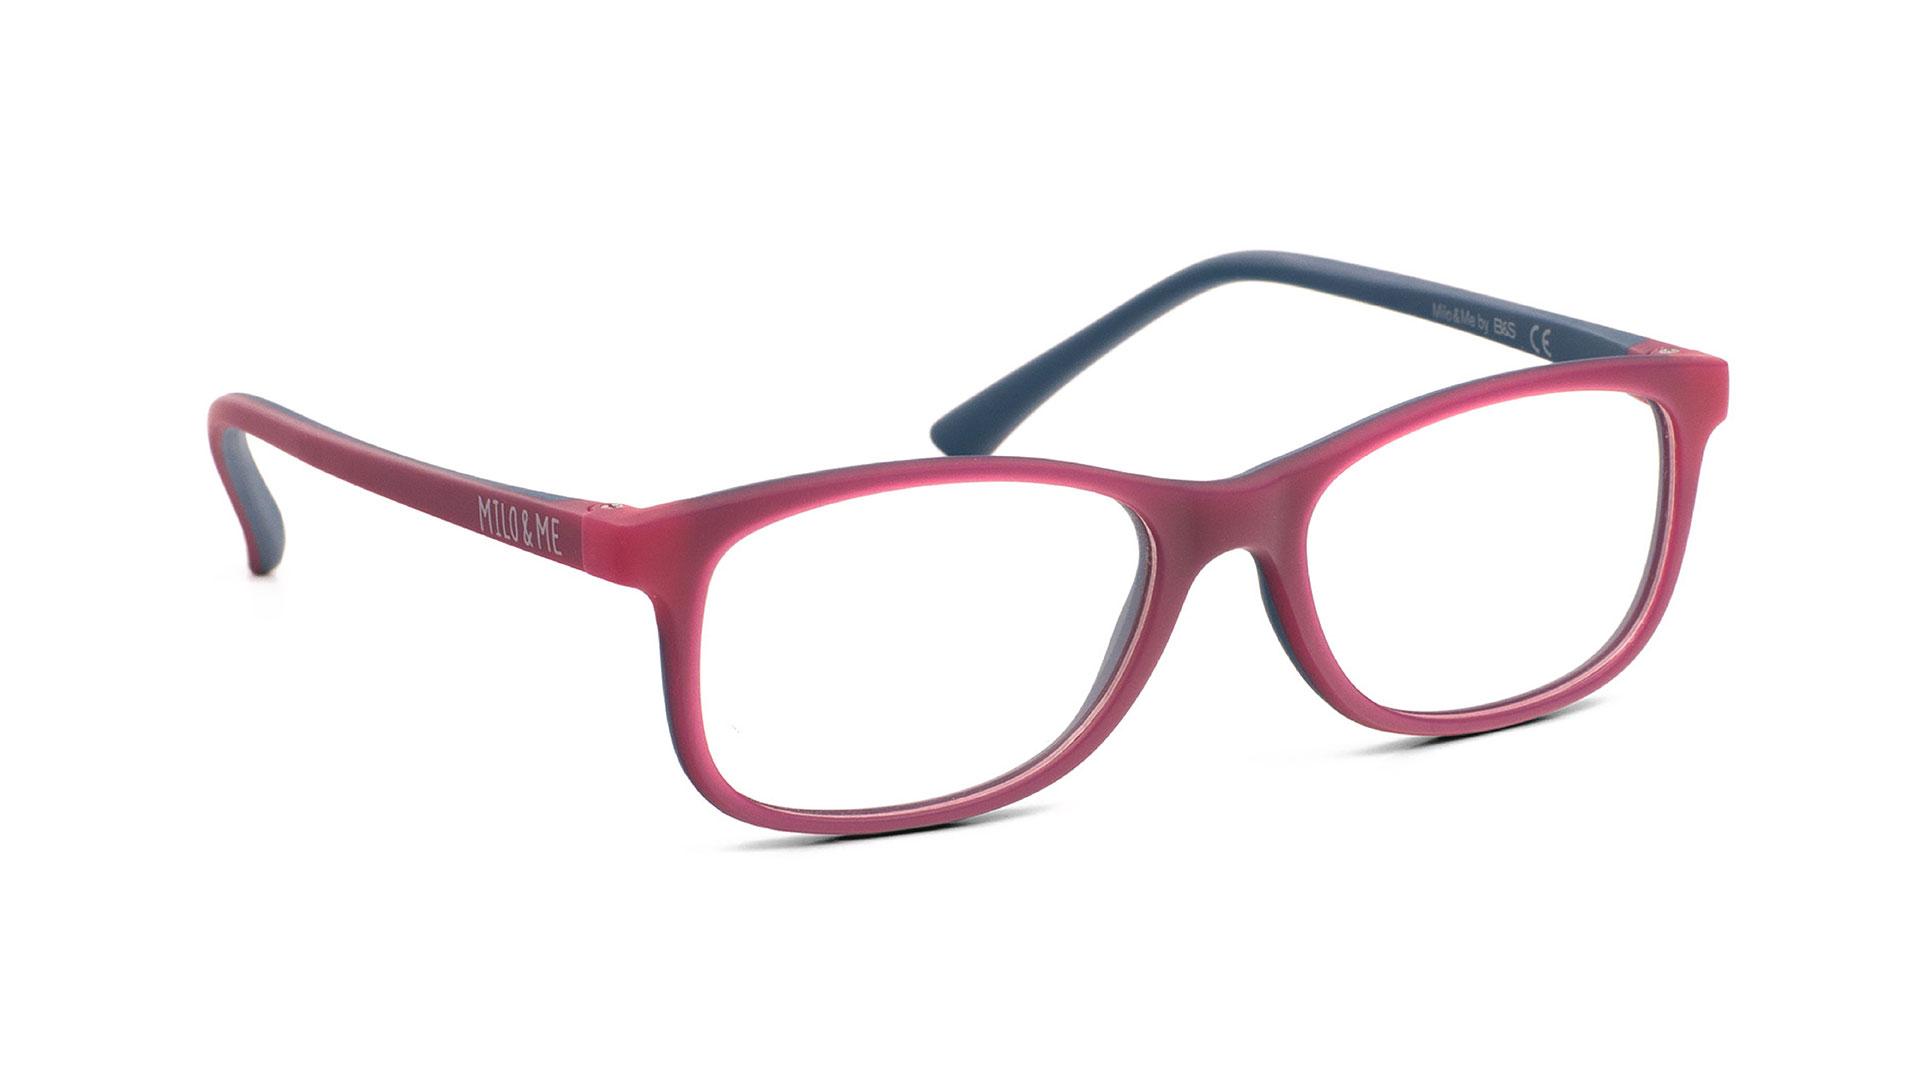 Blackberry Dark Blue H85040-25 - Milo & Me Eyewear - Optimum RX Lens Specialists